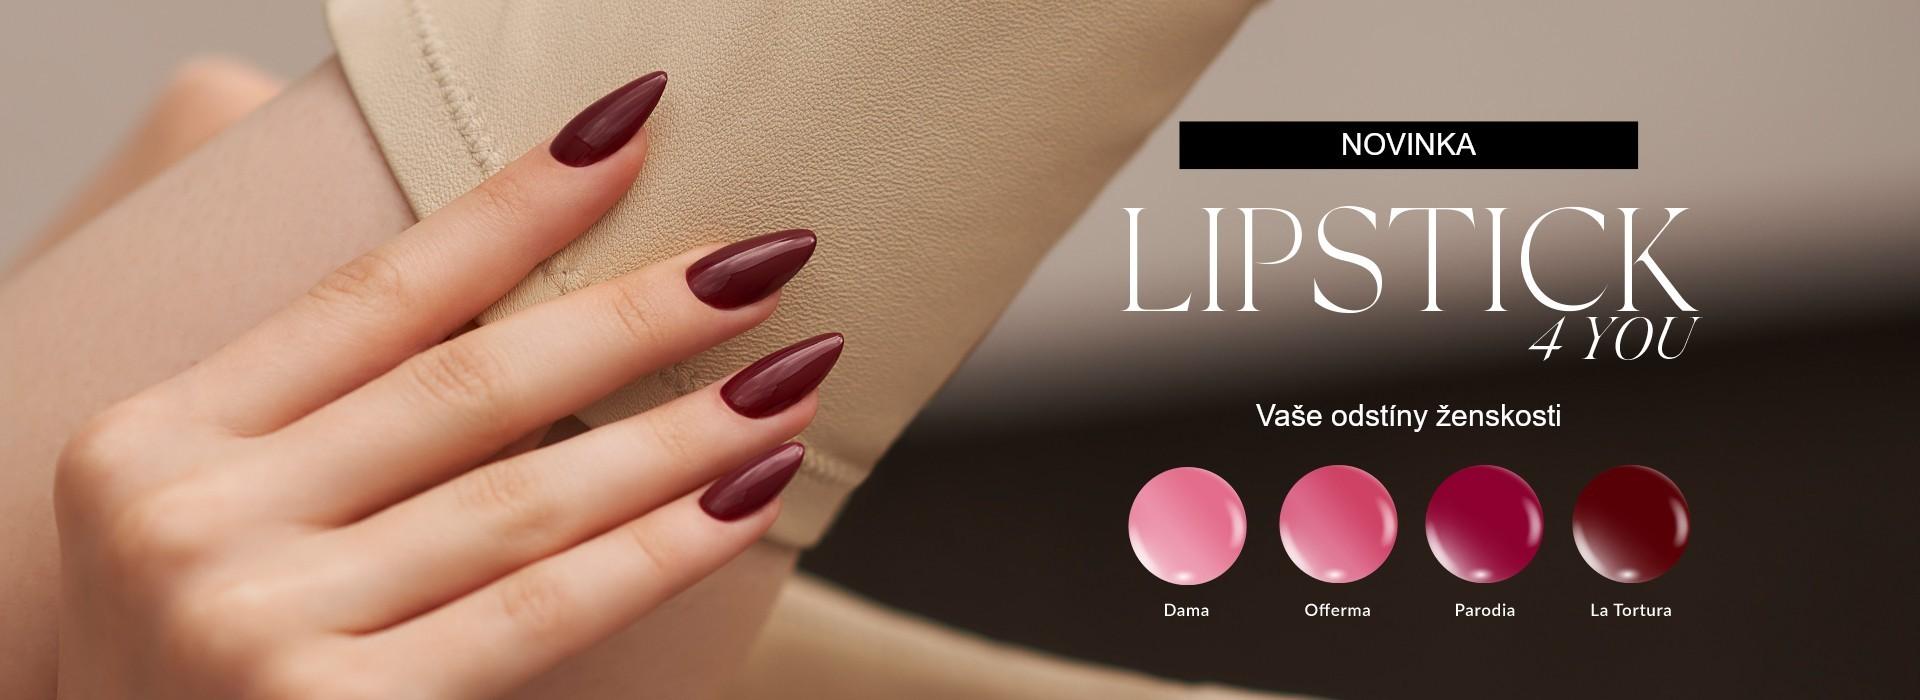 Lipstick 4 You